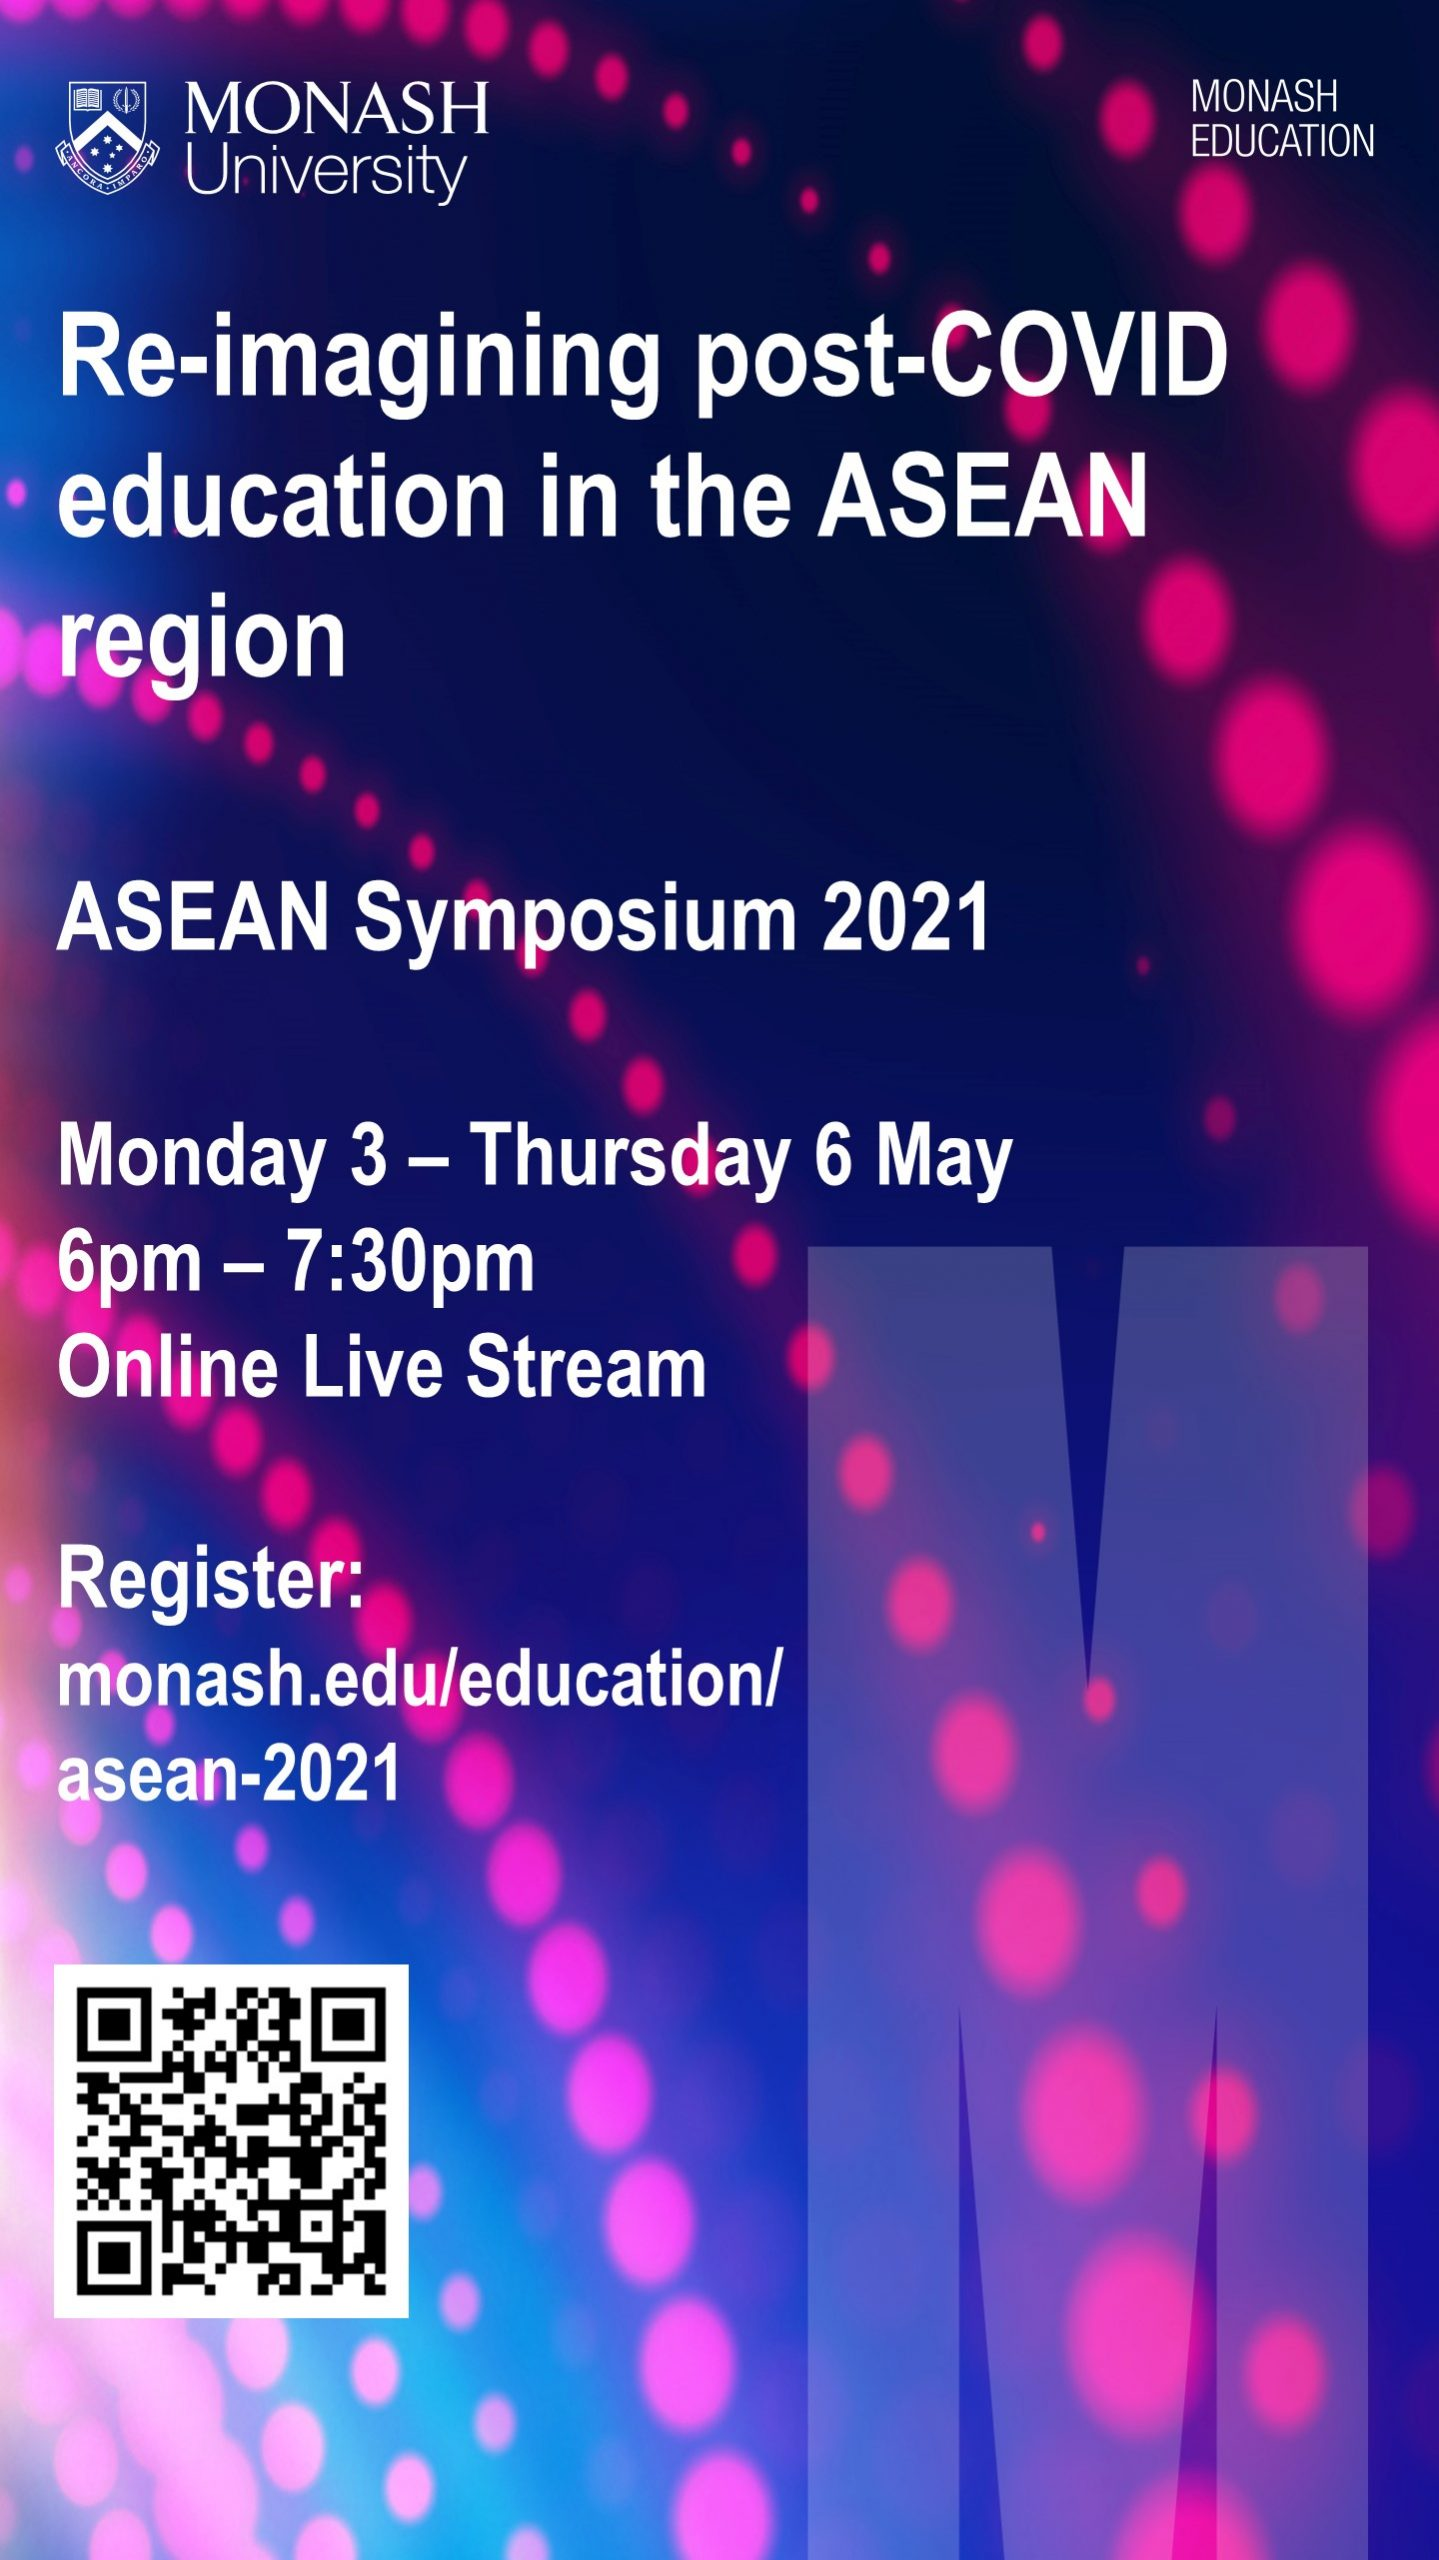 ASEAN Symposium – Re-imagining post-COVID education in the ASEAN region